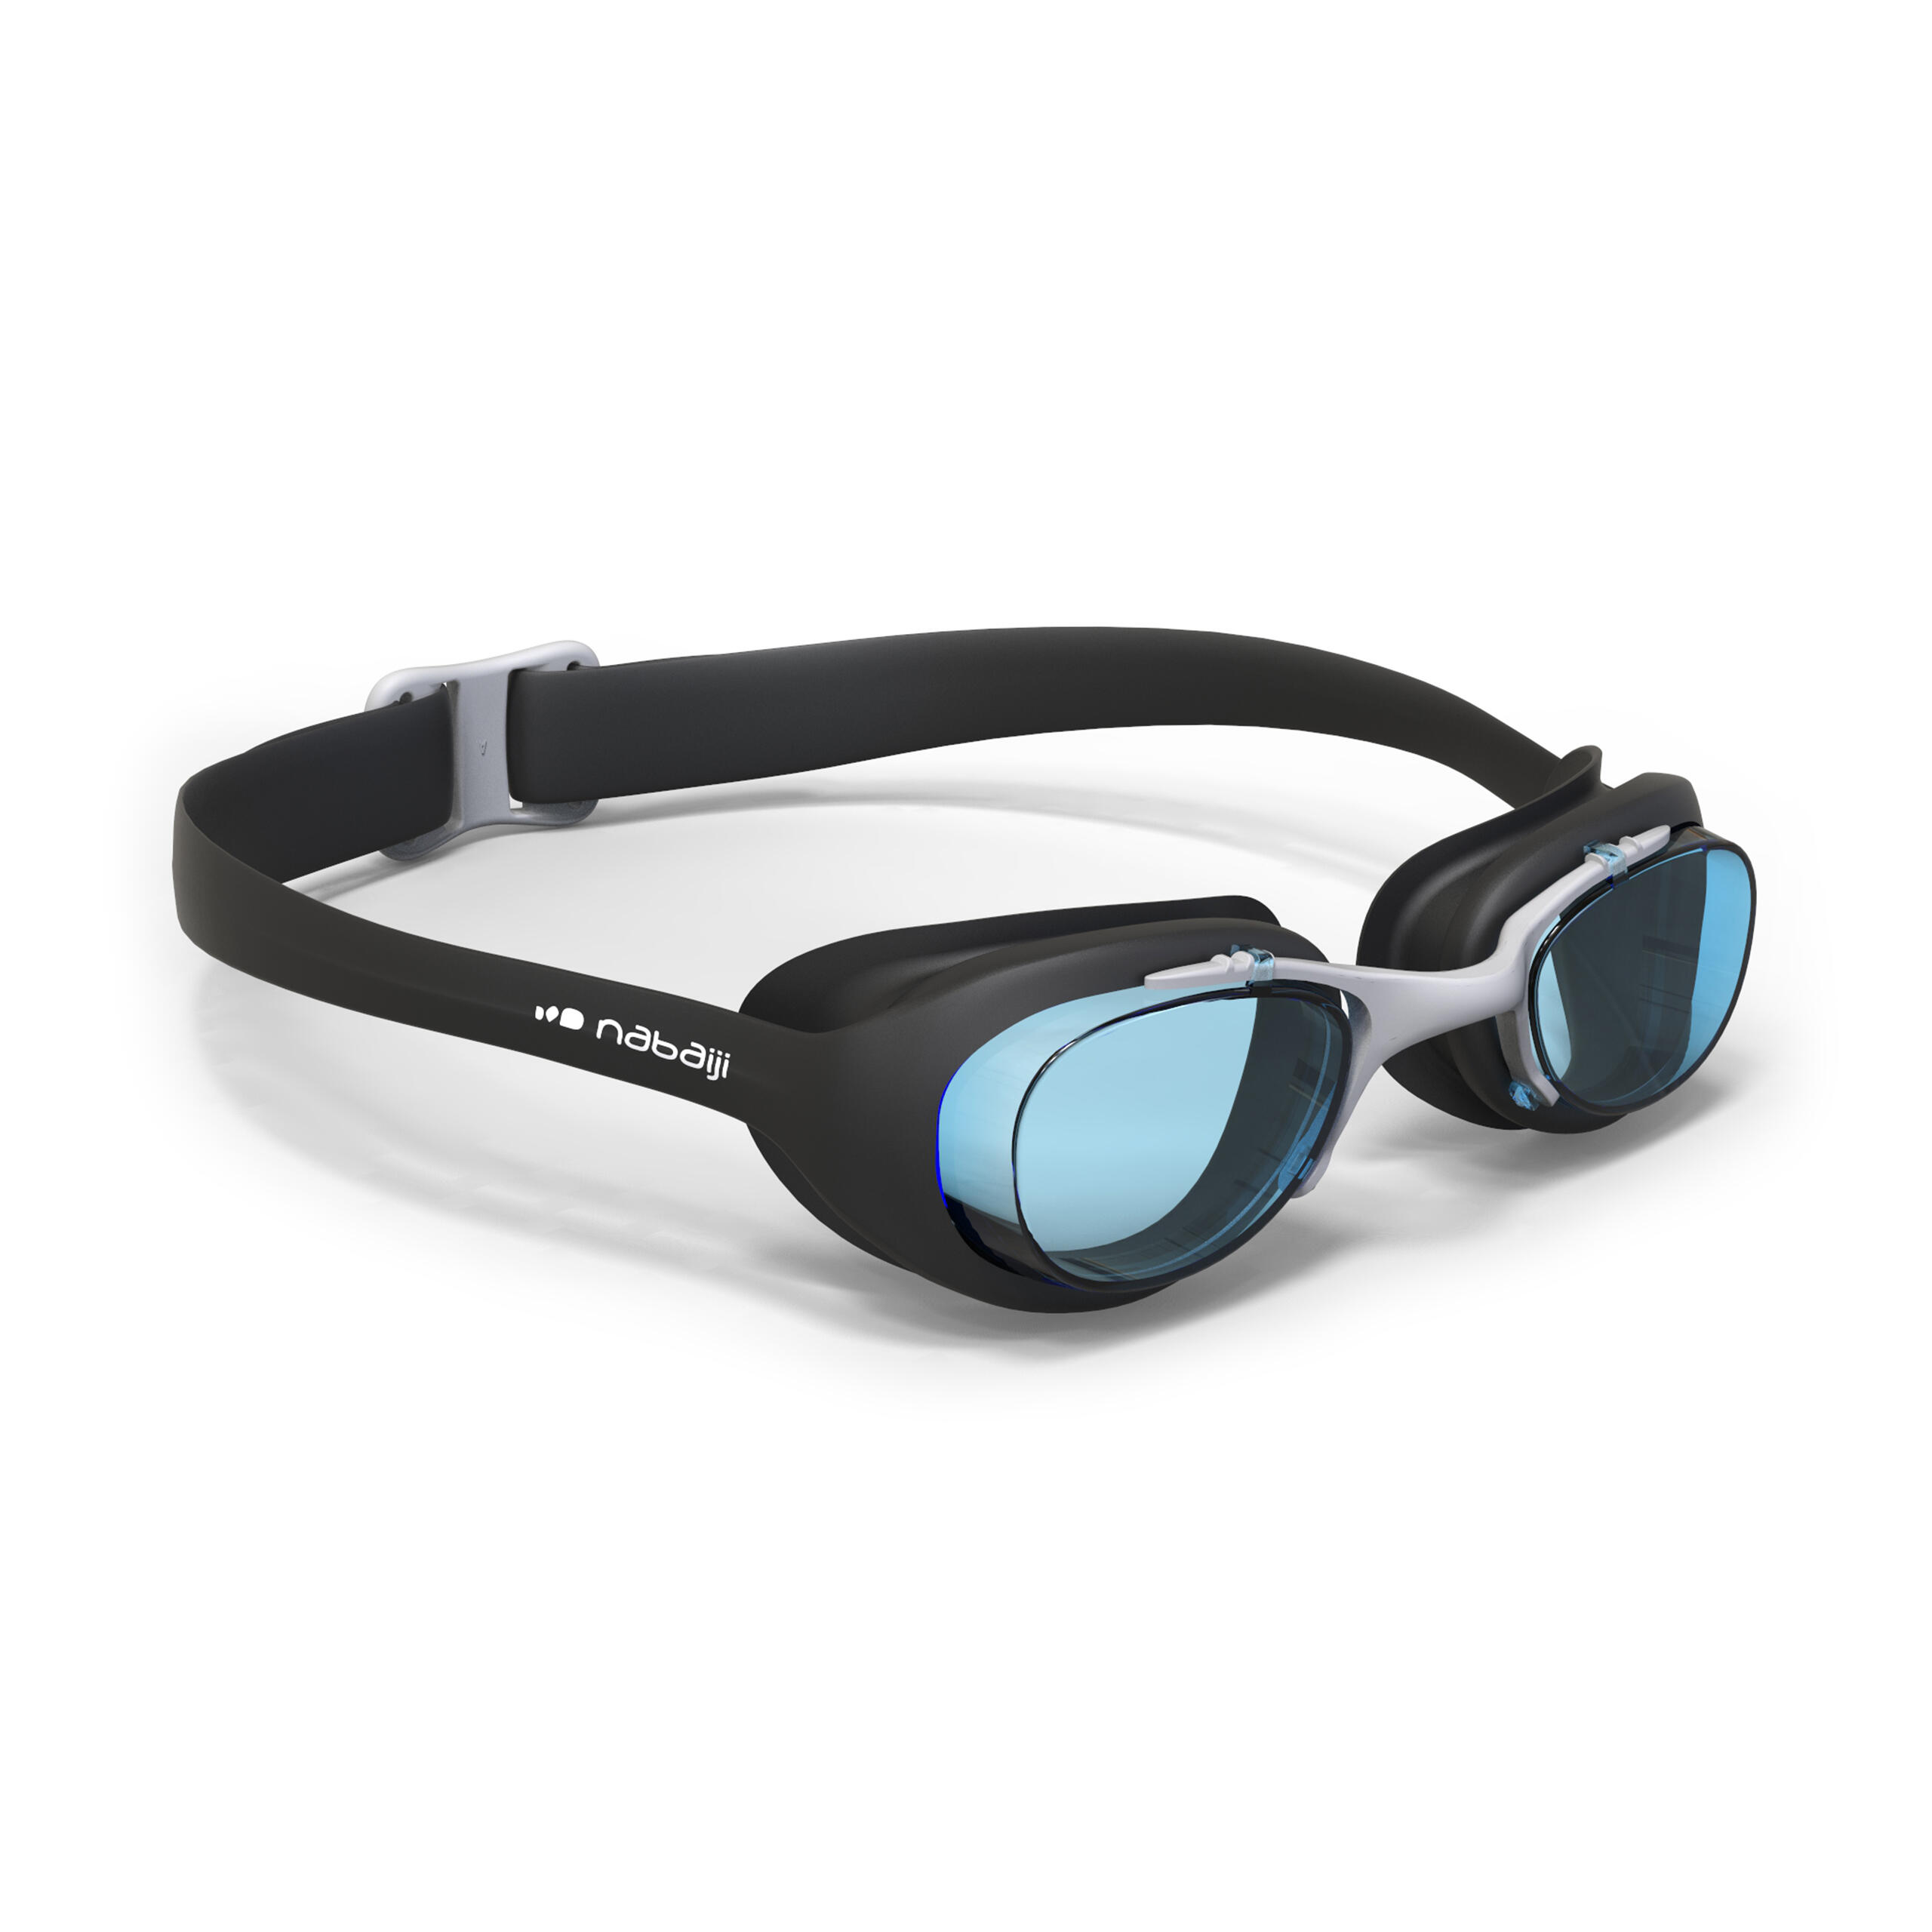 XBASE Swimming Goggles Size L - Black